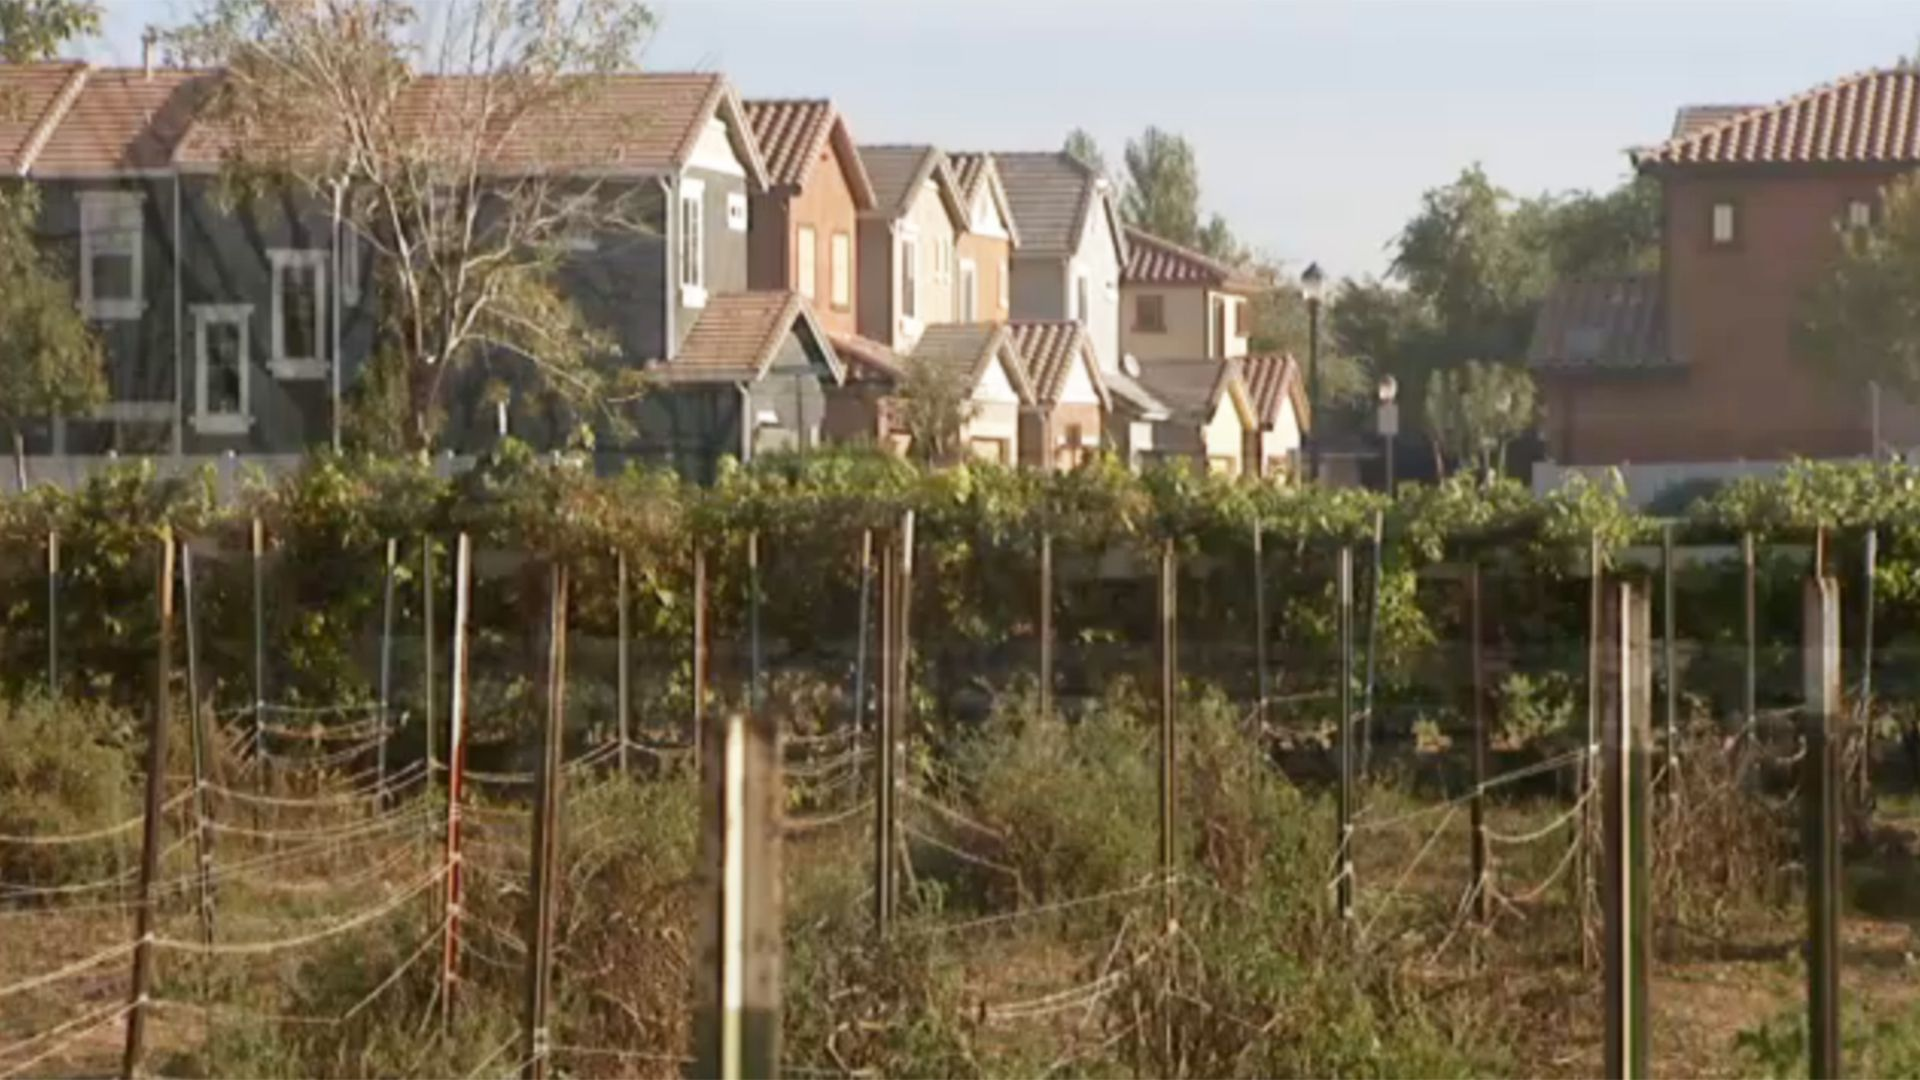 Agritopia How Farm To Table Living Is Taking Root In Suburban Phoenix Living Table Suburban Farm